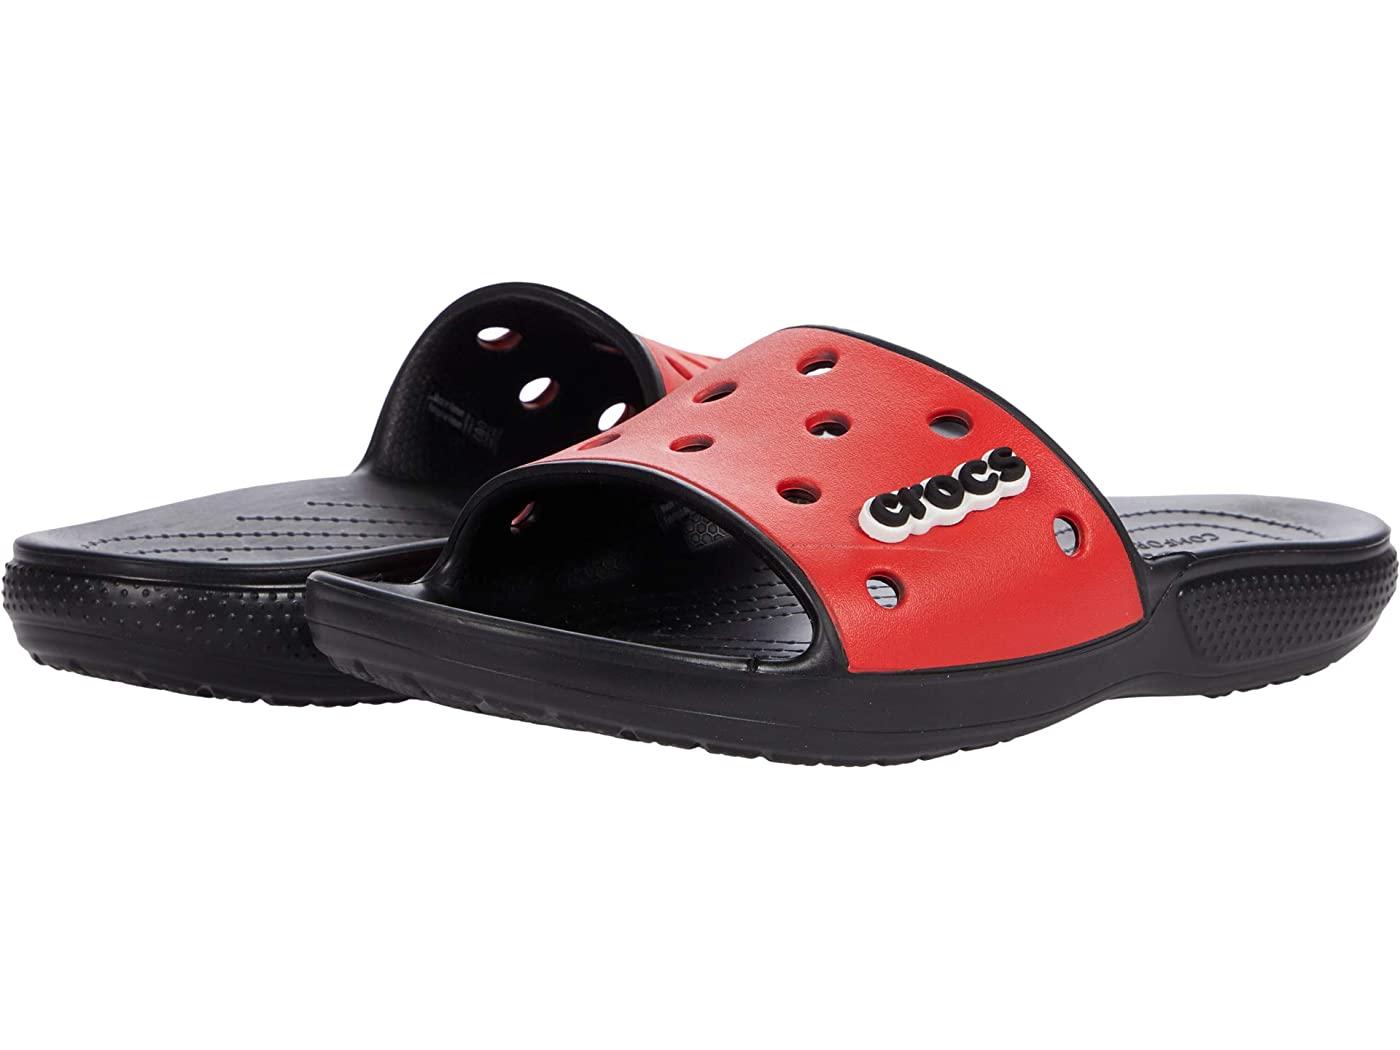 Crocs slides sandals